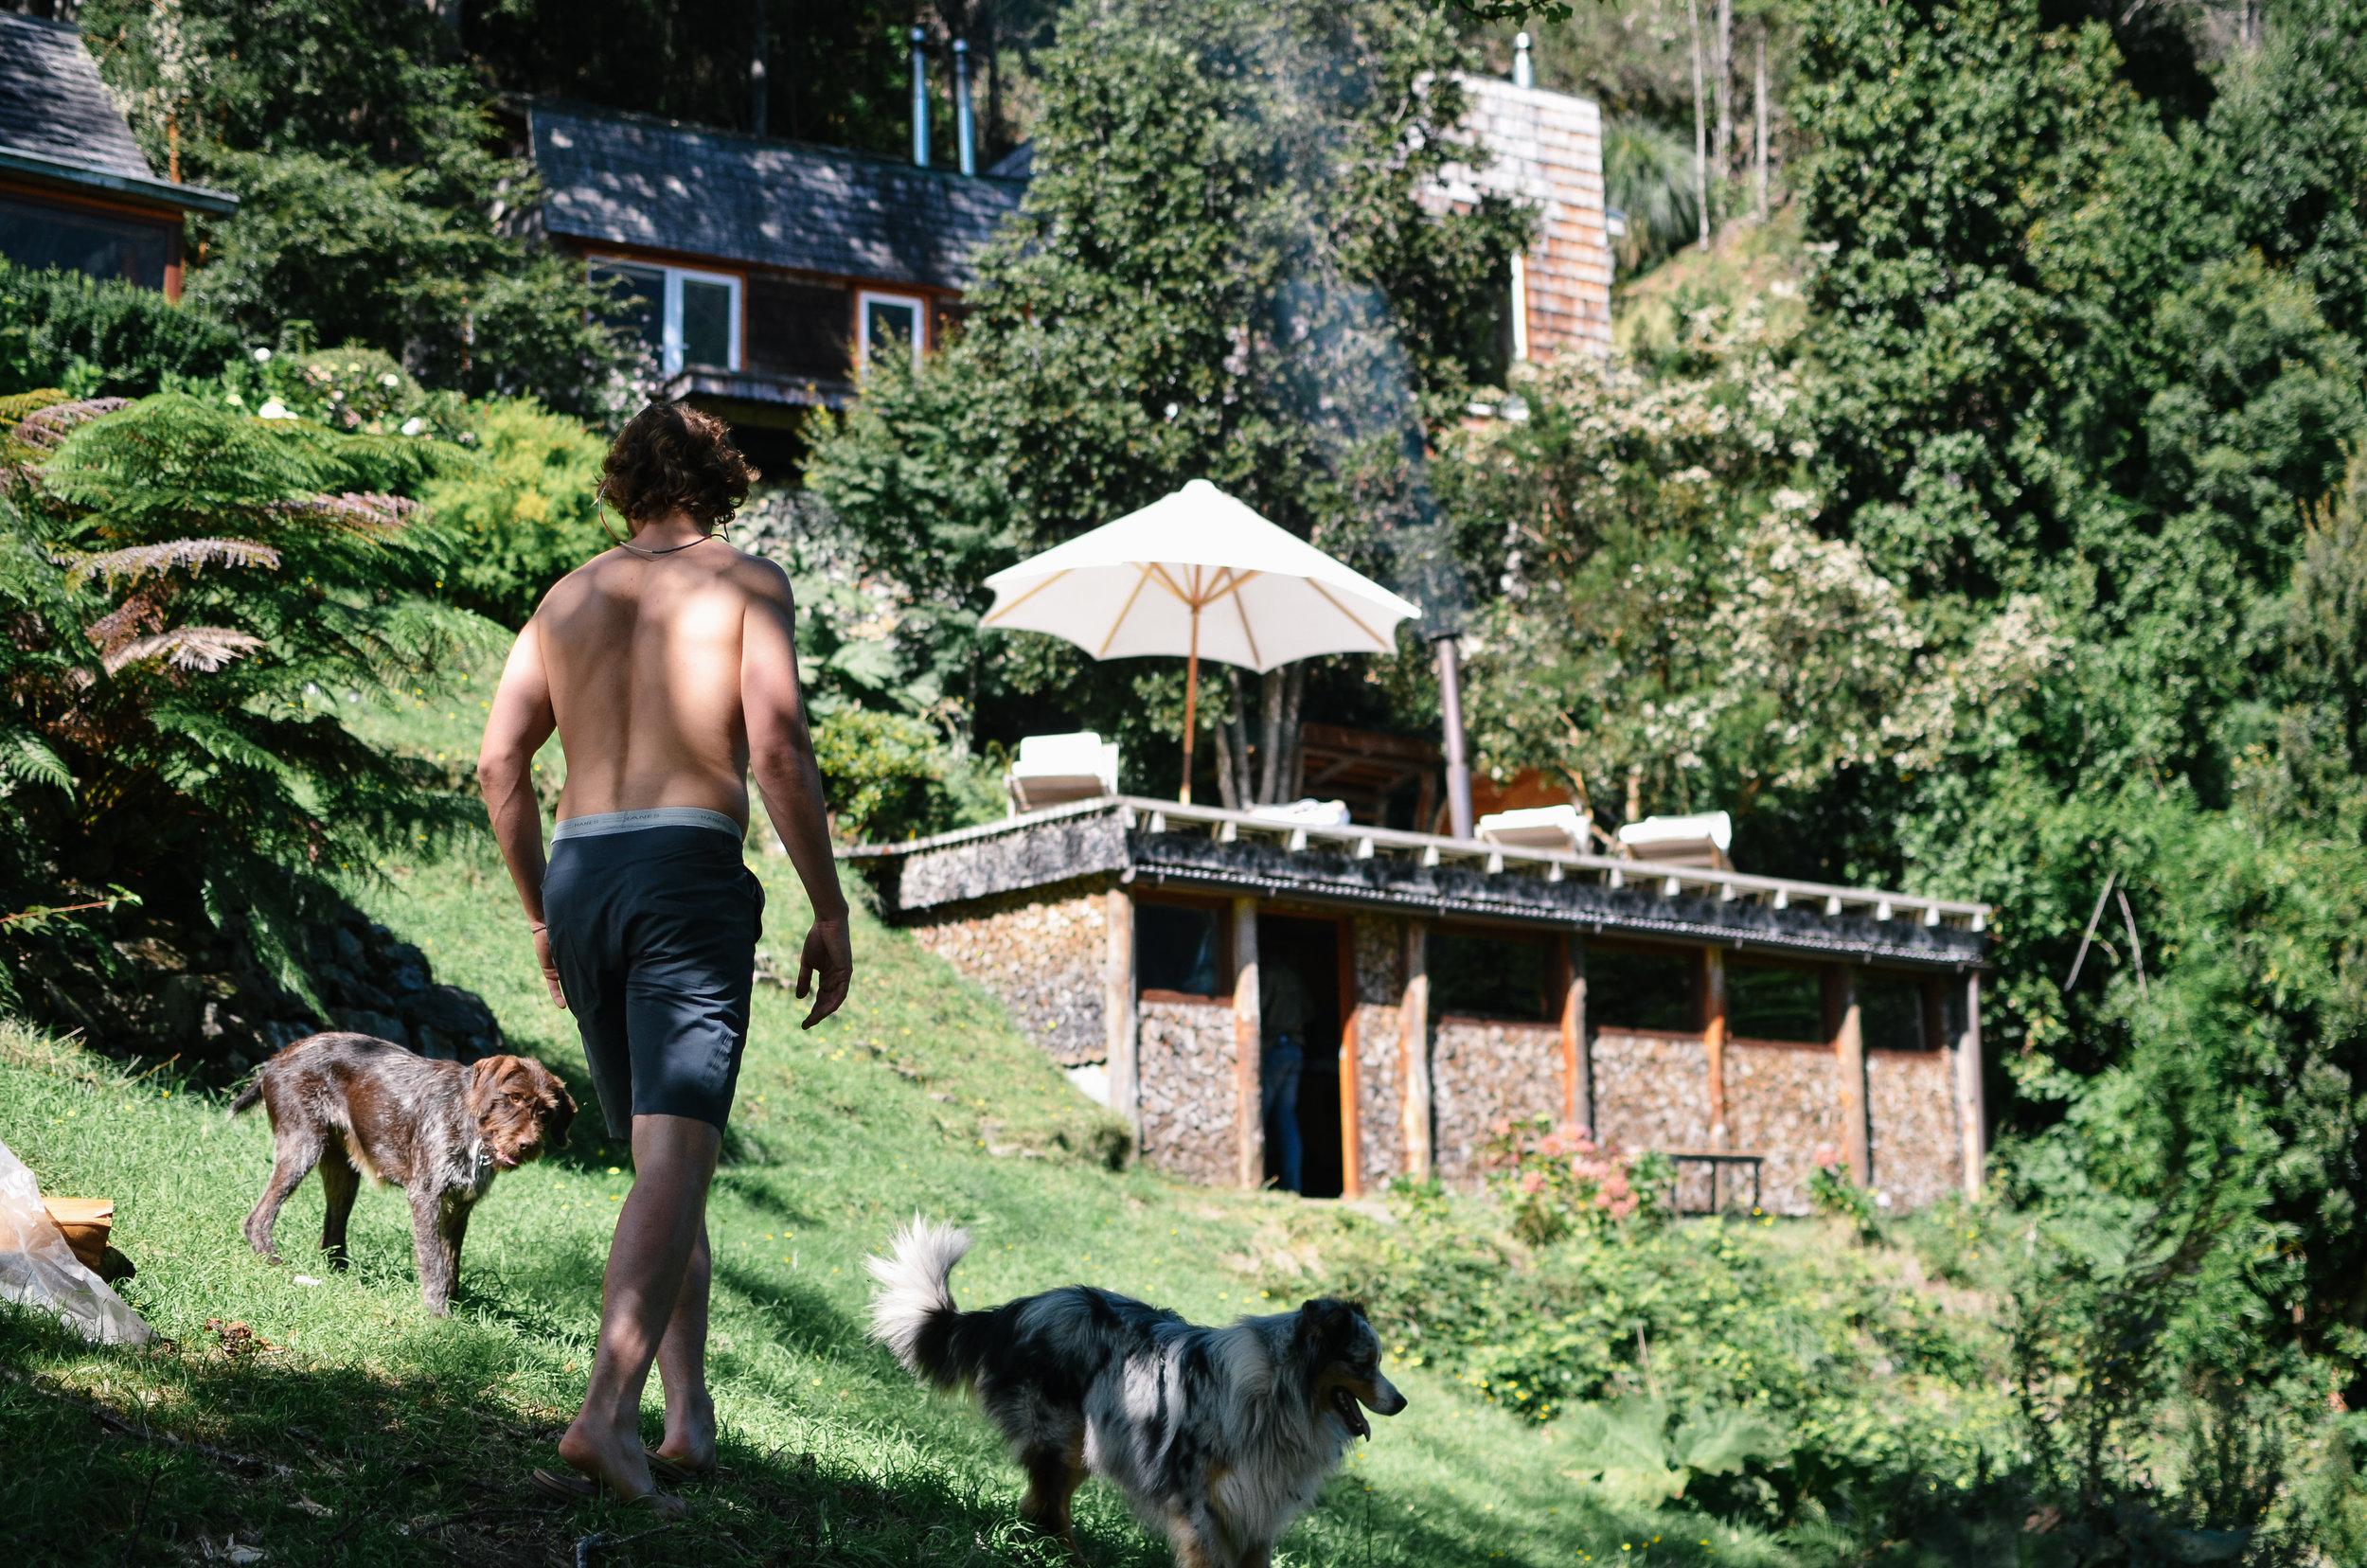 barraco+lodge+chile+life+on+pine+travel+blog+life+on+pine_DSC_1396.jpg